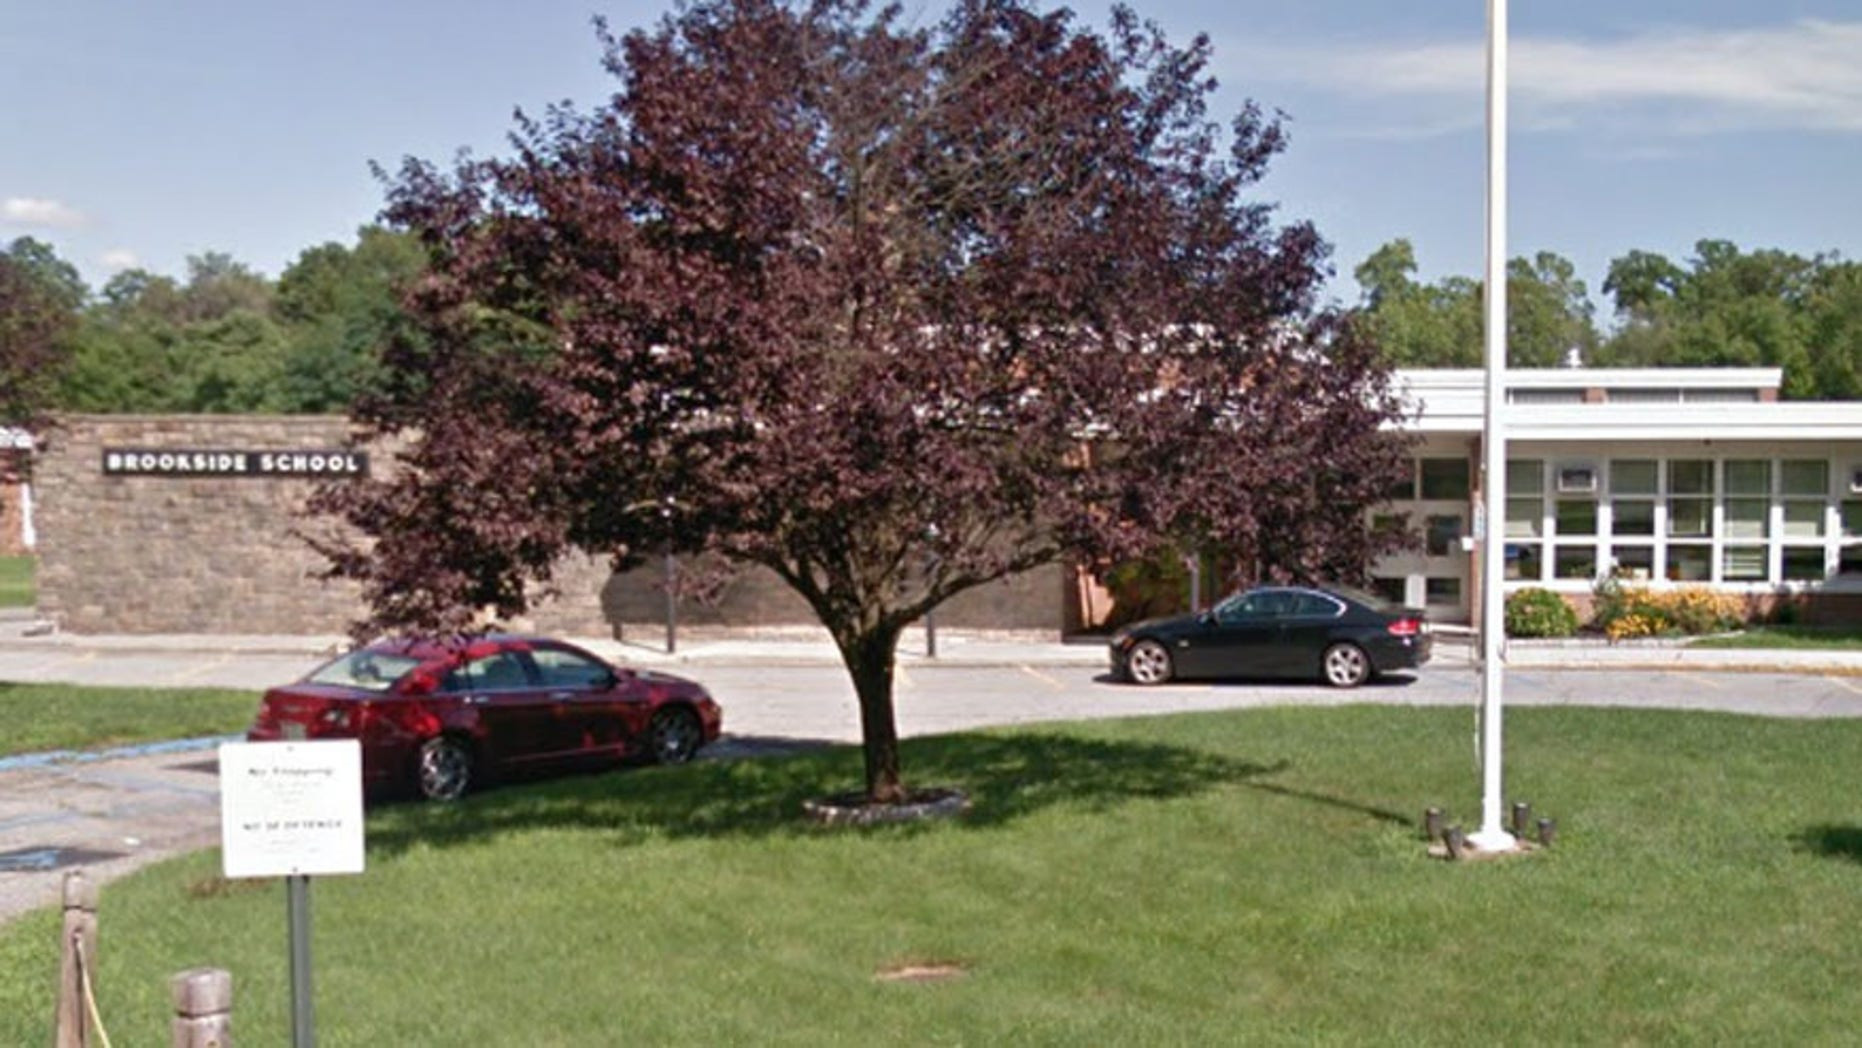 Brookside Elementary School in Ossining, N.Y.